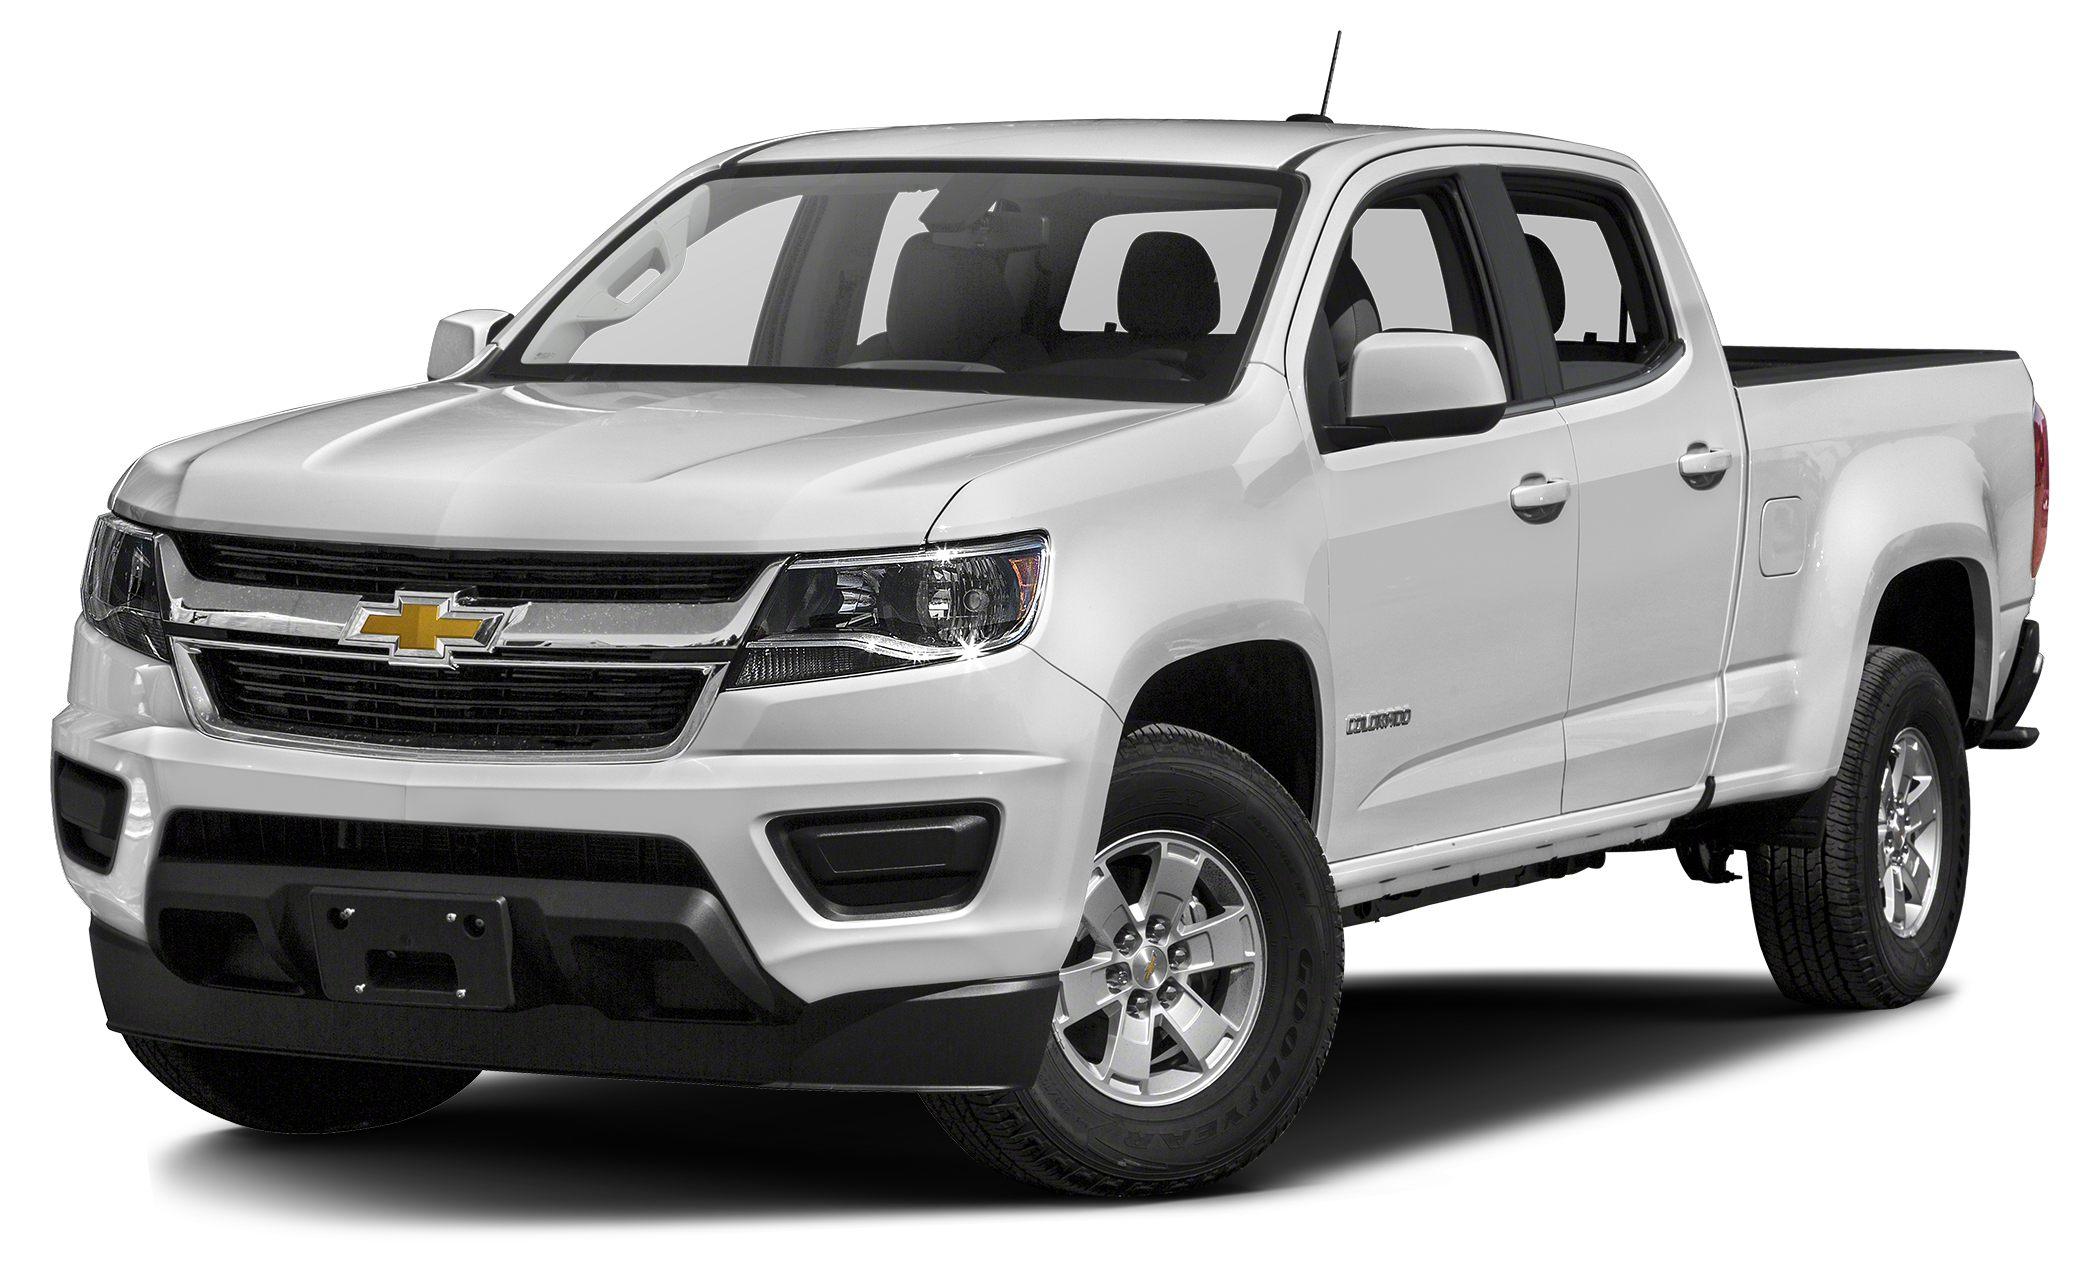 2018 Chevrolet Colorado WT SUMMIT WHITE exterior and JET BLACK  DARK ASH interior 4WD Work Truck